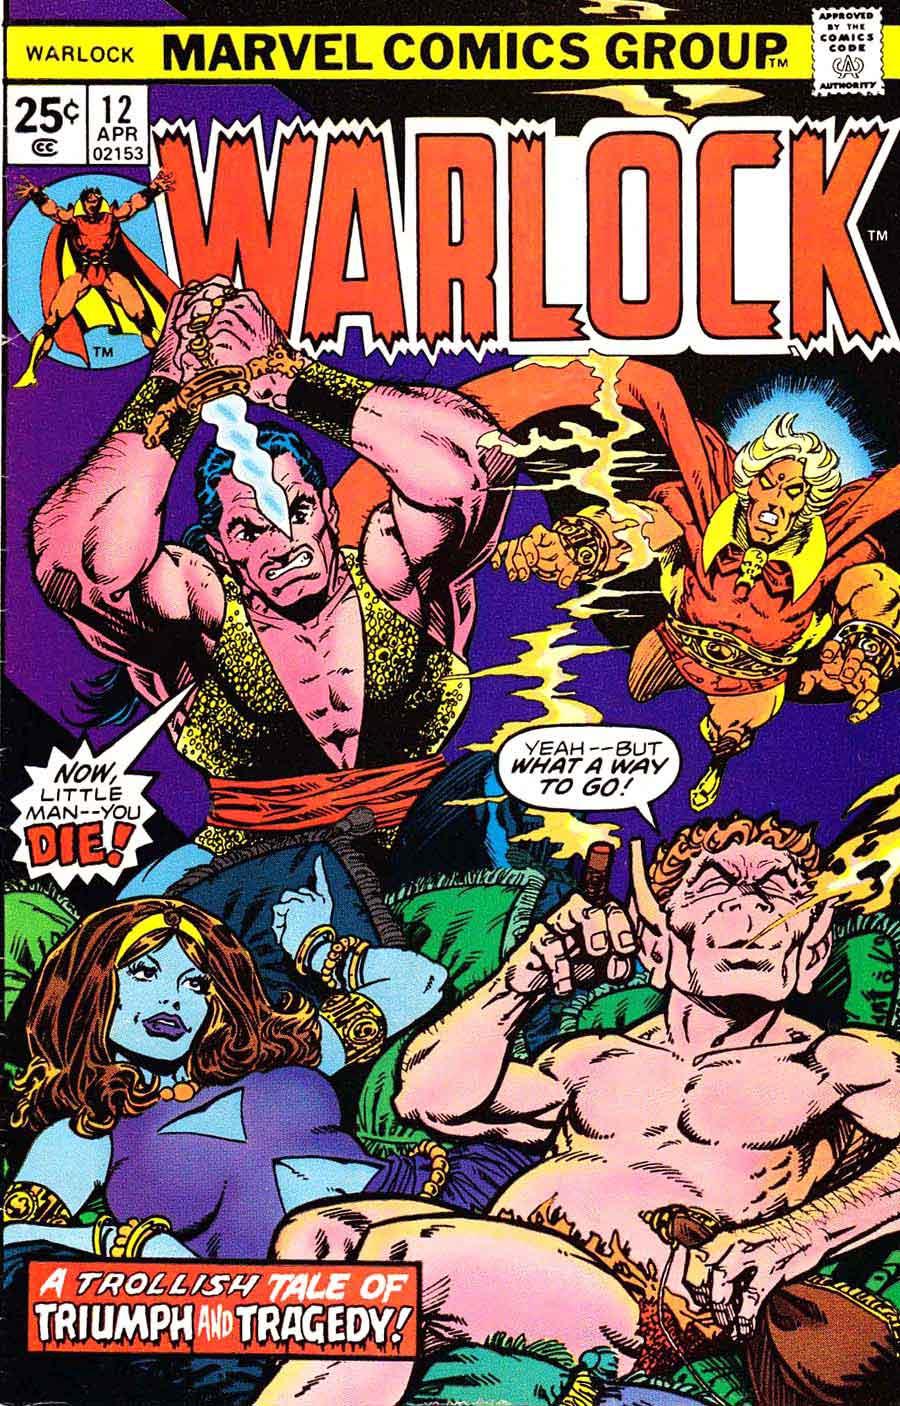 Warlock v1 #12 marvel 1970s bronze age comic book cover art by Jim Starlin